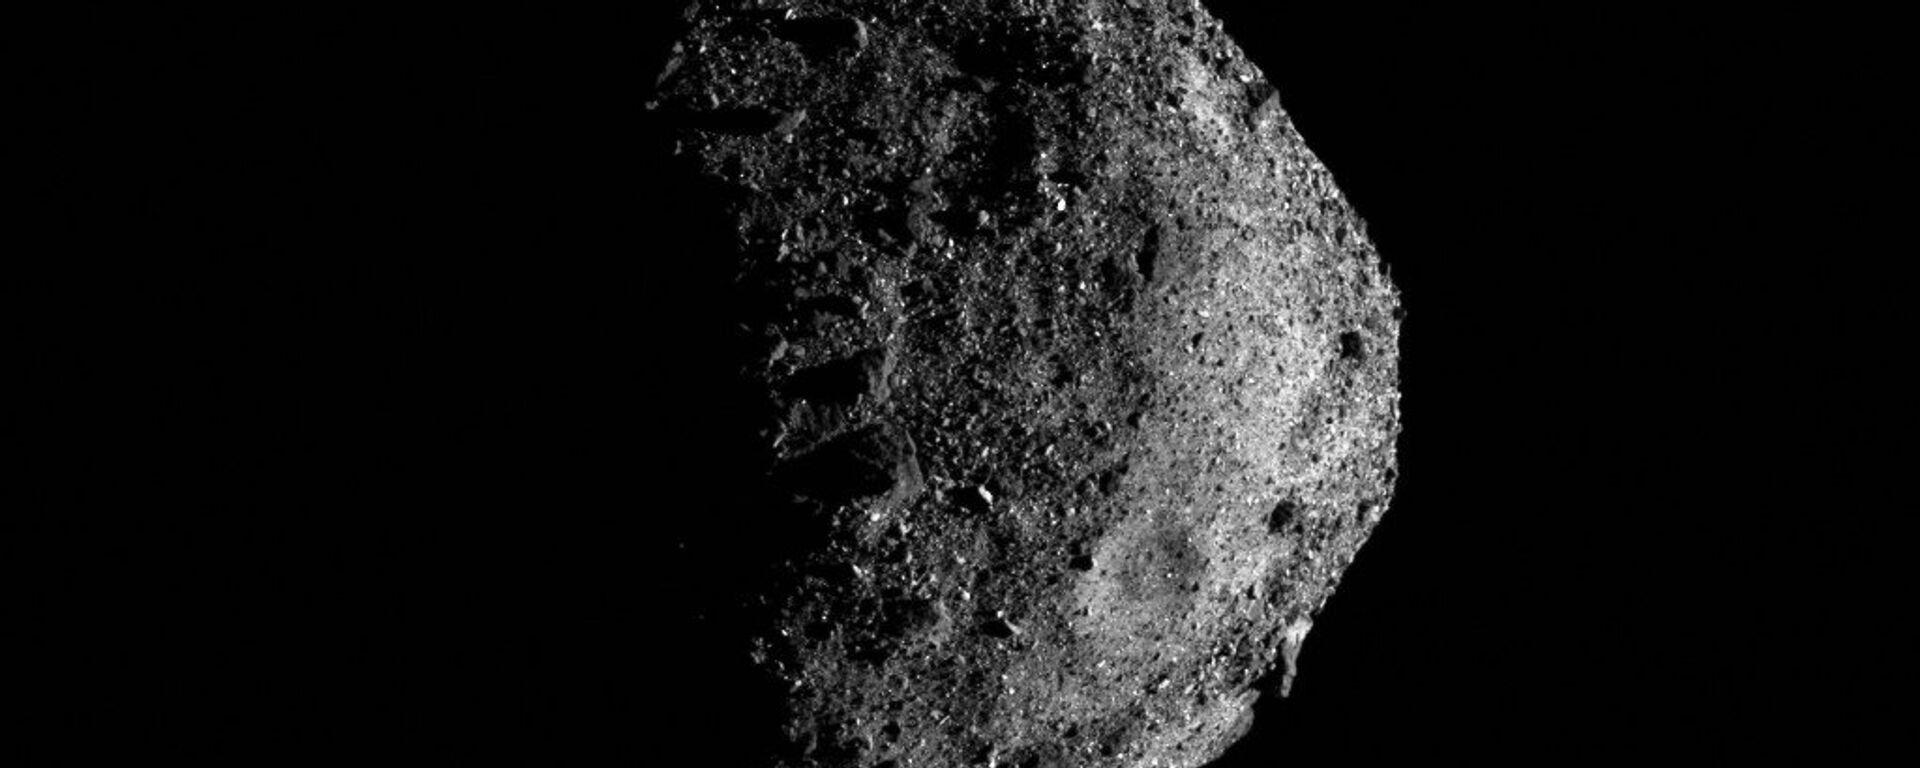 L'asteroide 101955 Bennu - Sputnik Italia, 1920, 25.08.2021